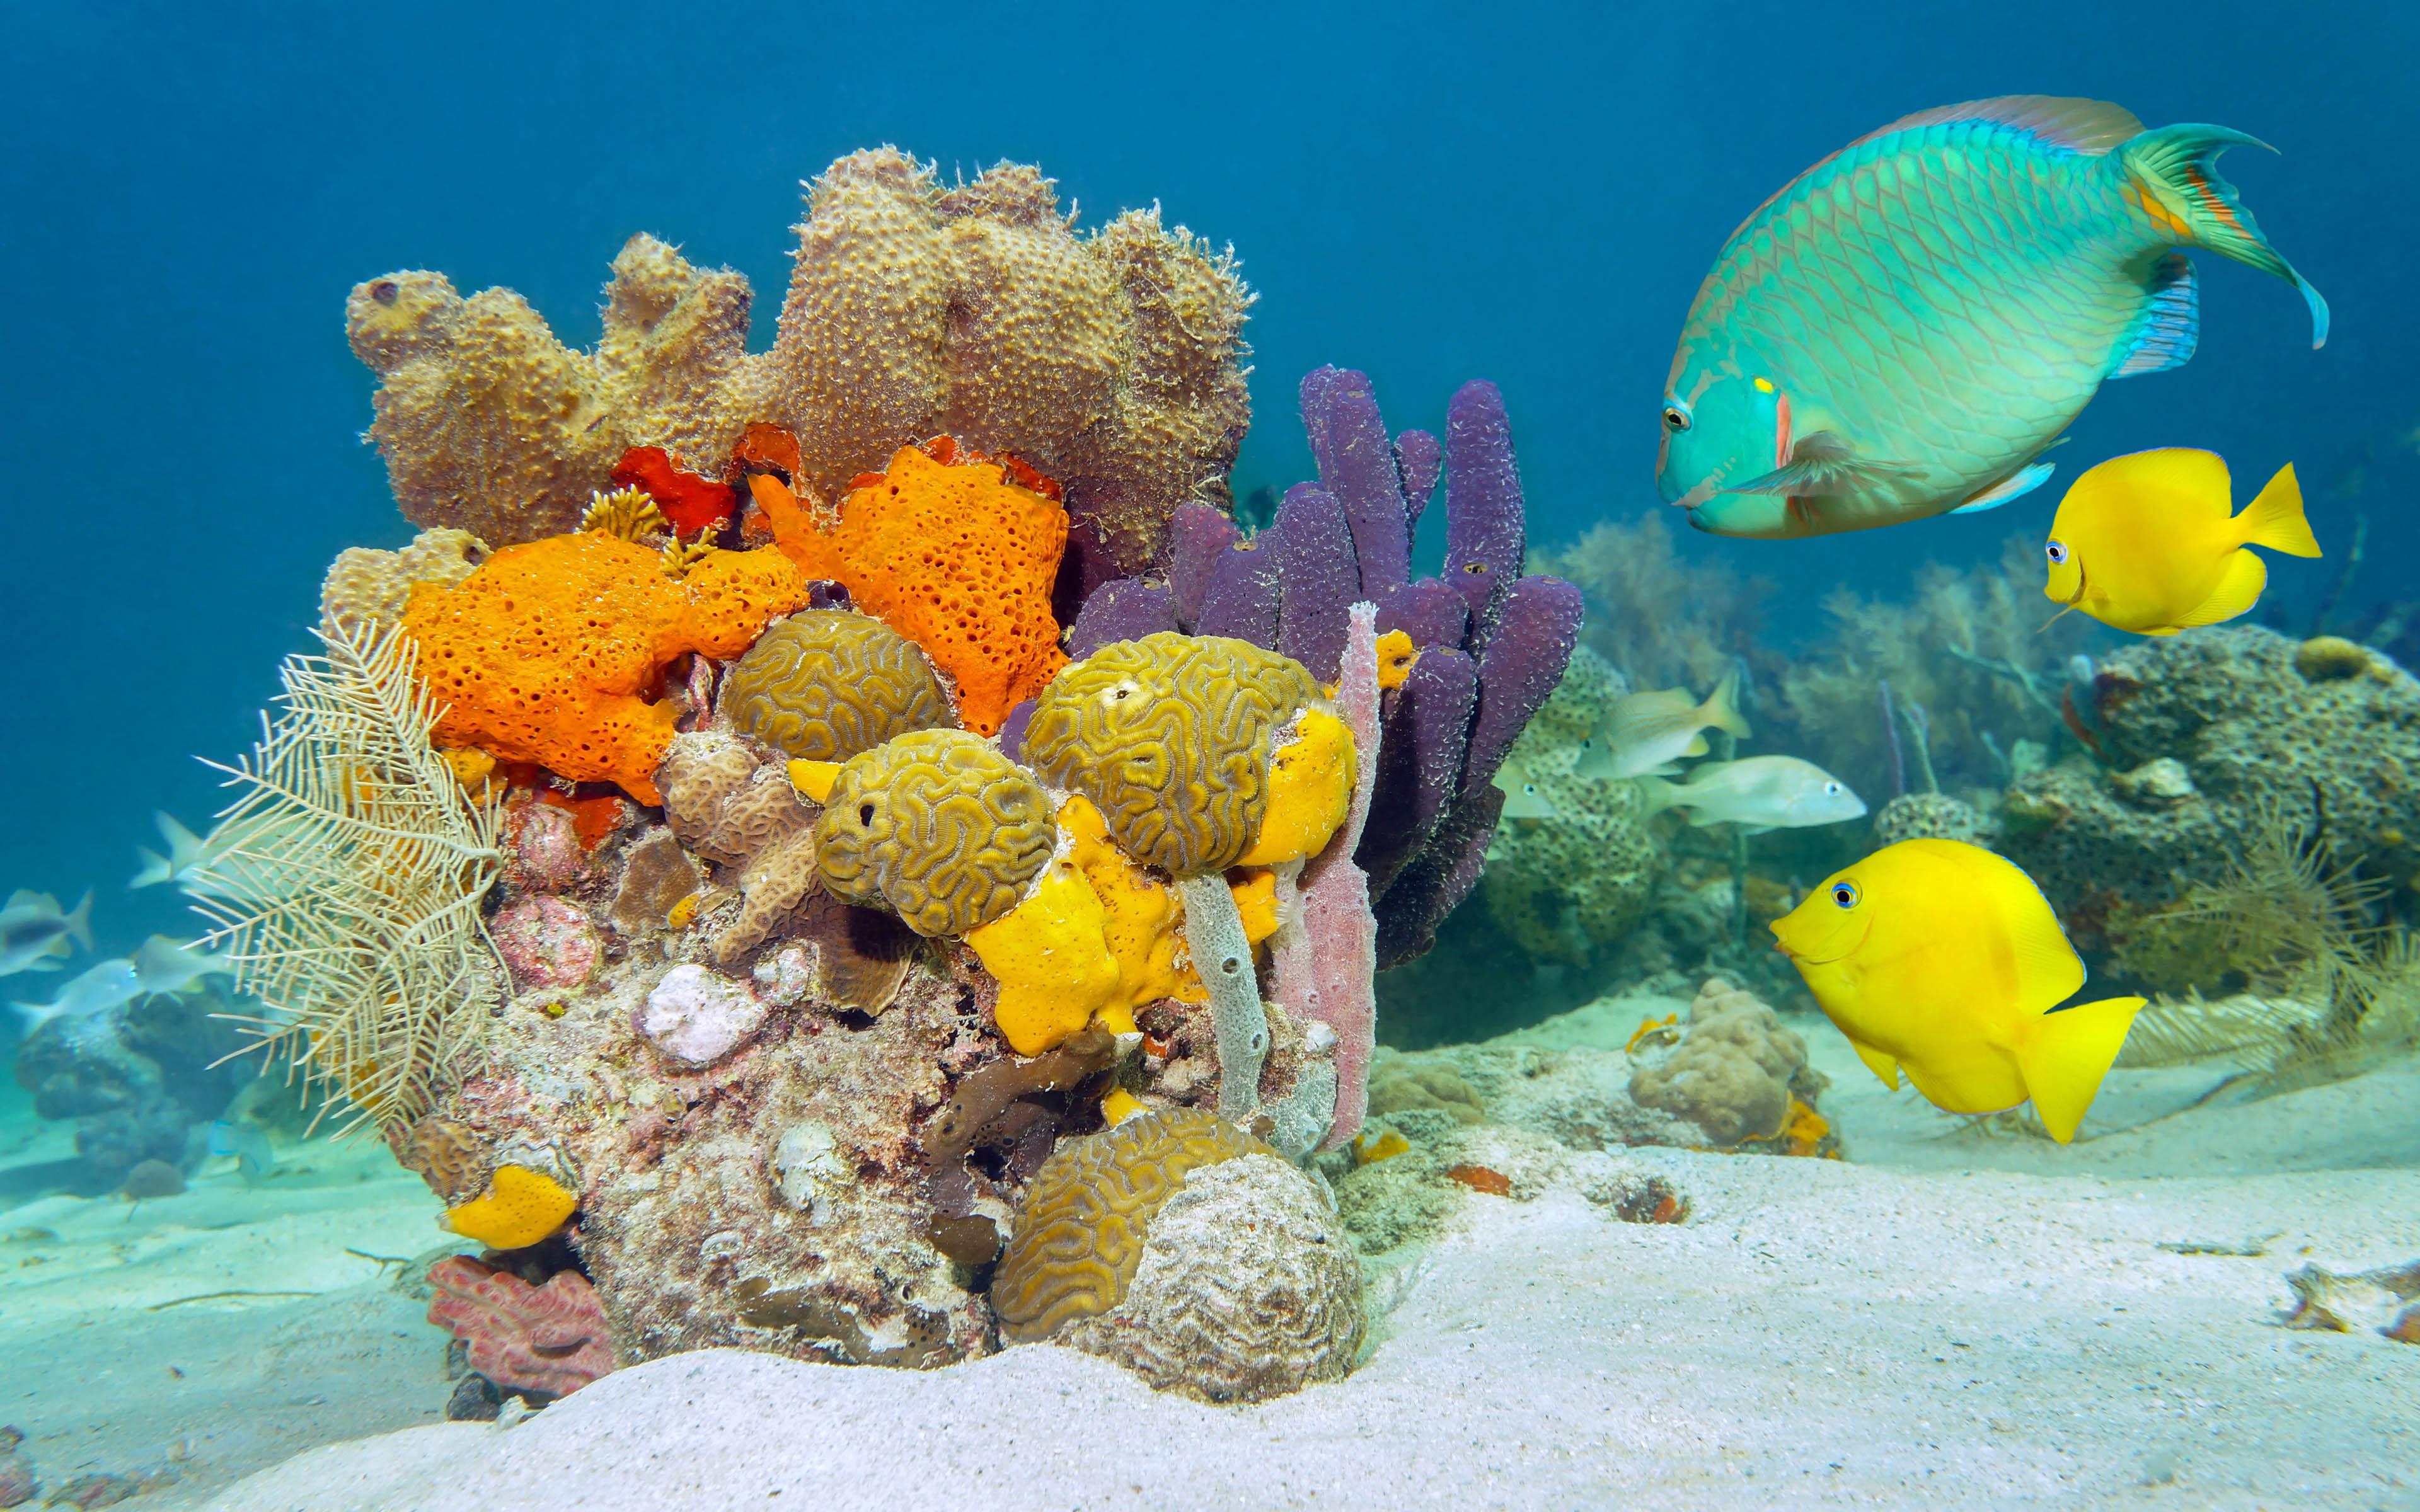 Green Parrot Wallpaper 3d Underwater World Fish Desktop Wallpaper Hd Wallpapers13 Com